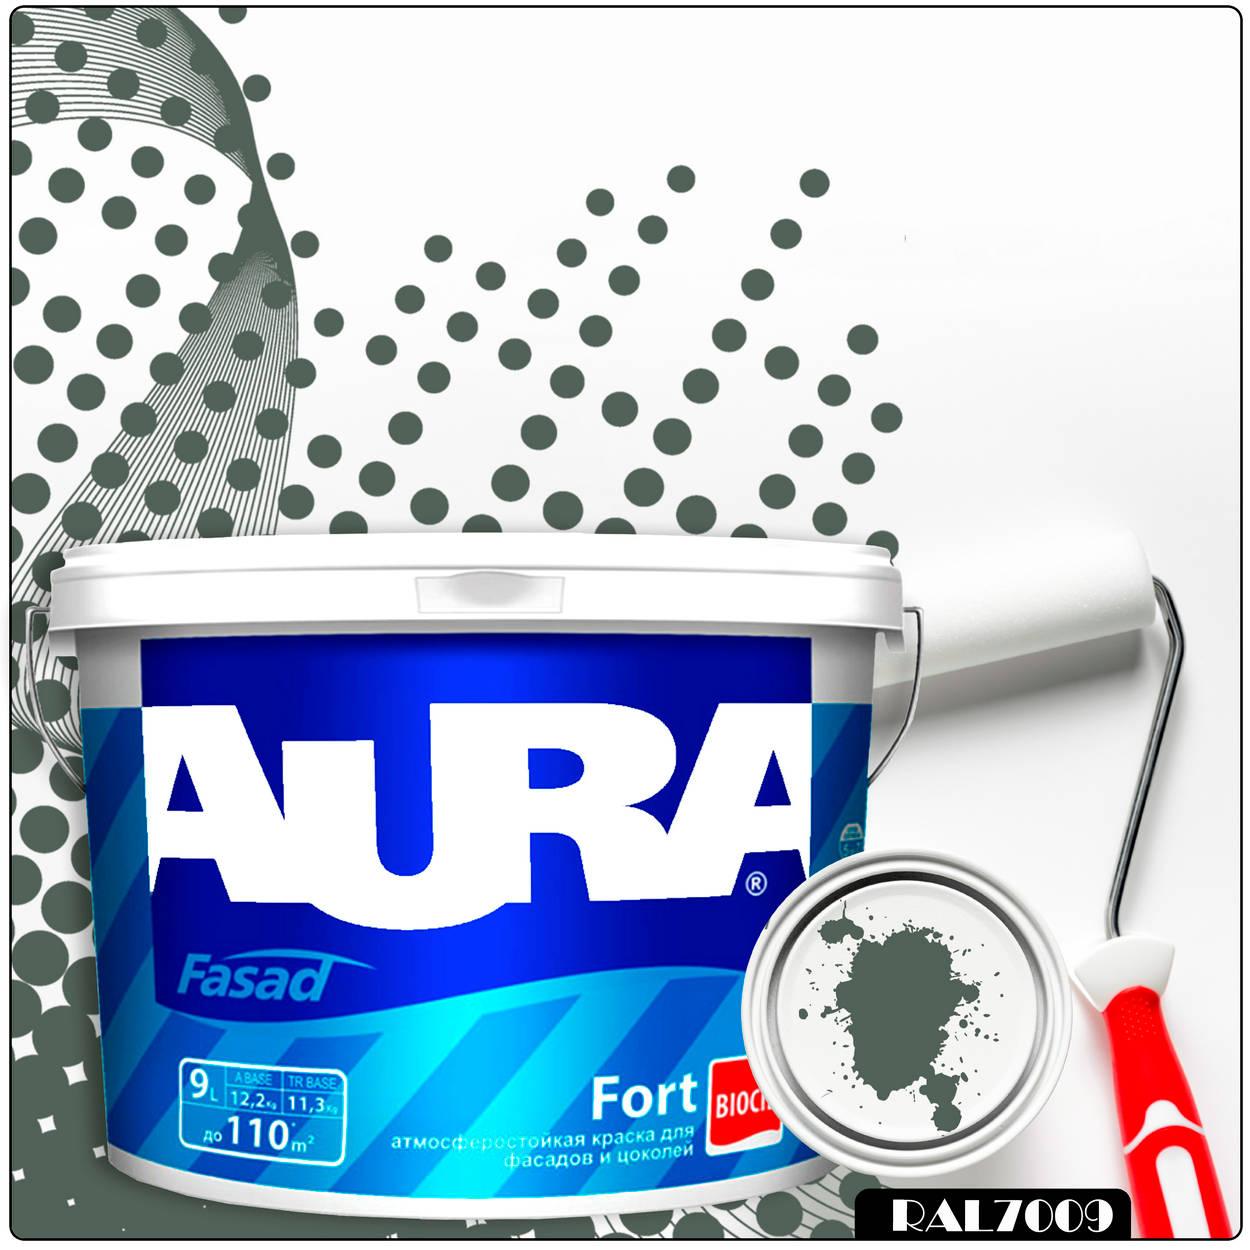 Фото 8 - Краска Aura Fasad Fort, RAL 7009 Зелёно-серый, латексная, матовая, для фасада и цоколей, 9л, Аура.